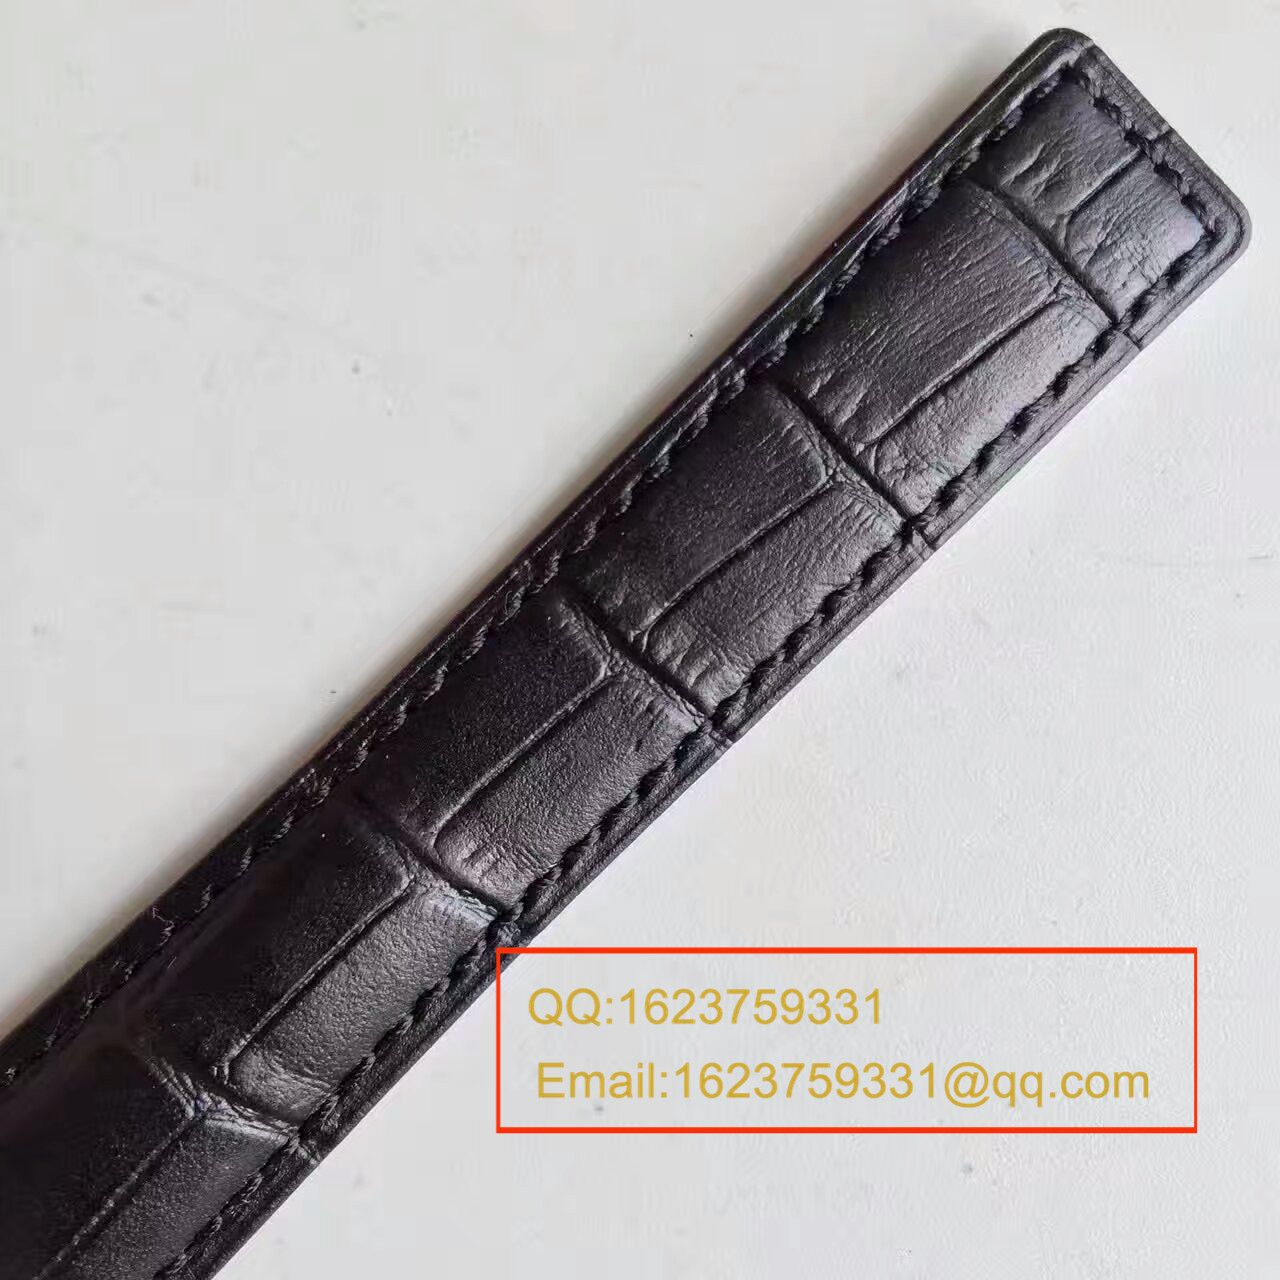 【HBBV6厂超A复刻手表】泰格豪雅卡莱拉系列CAR2141.FC8182腕表 / TG004